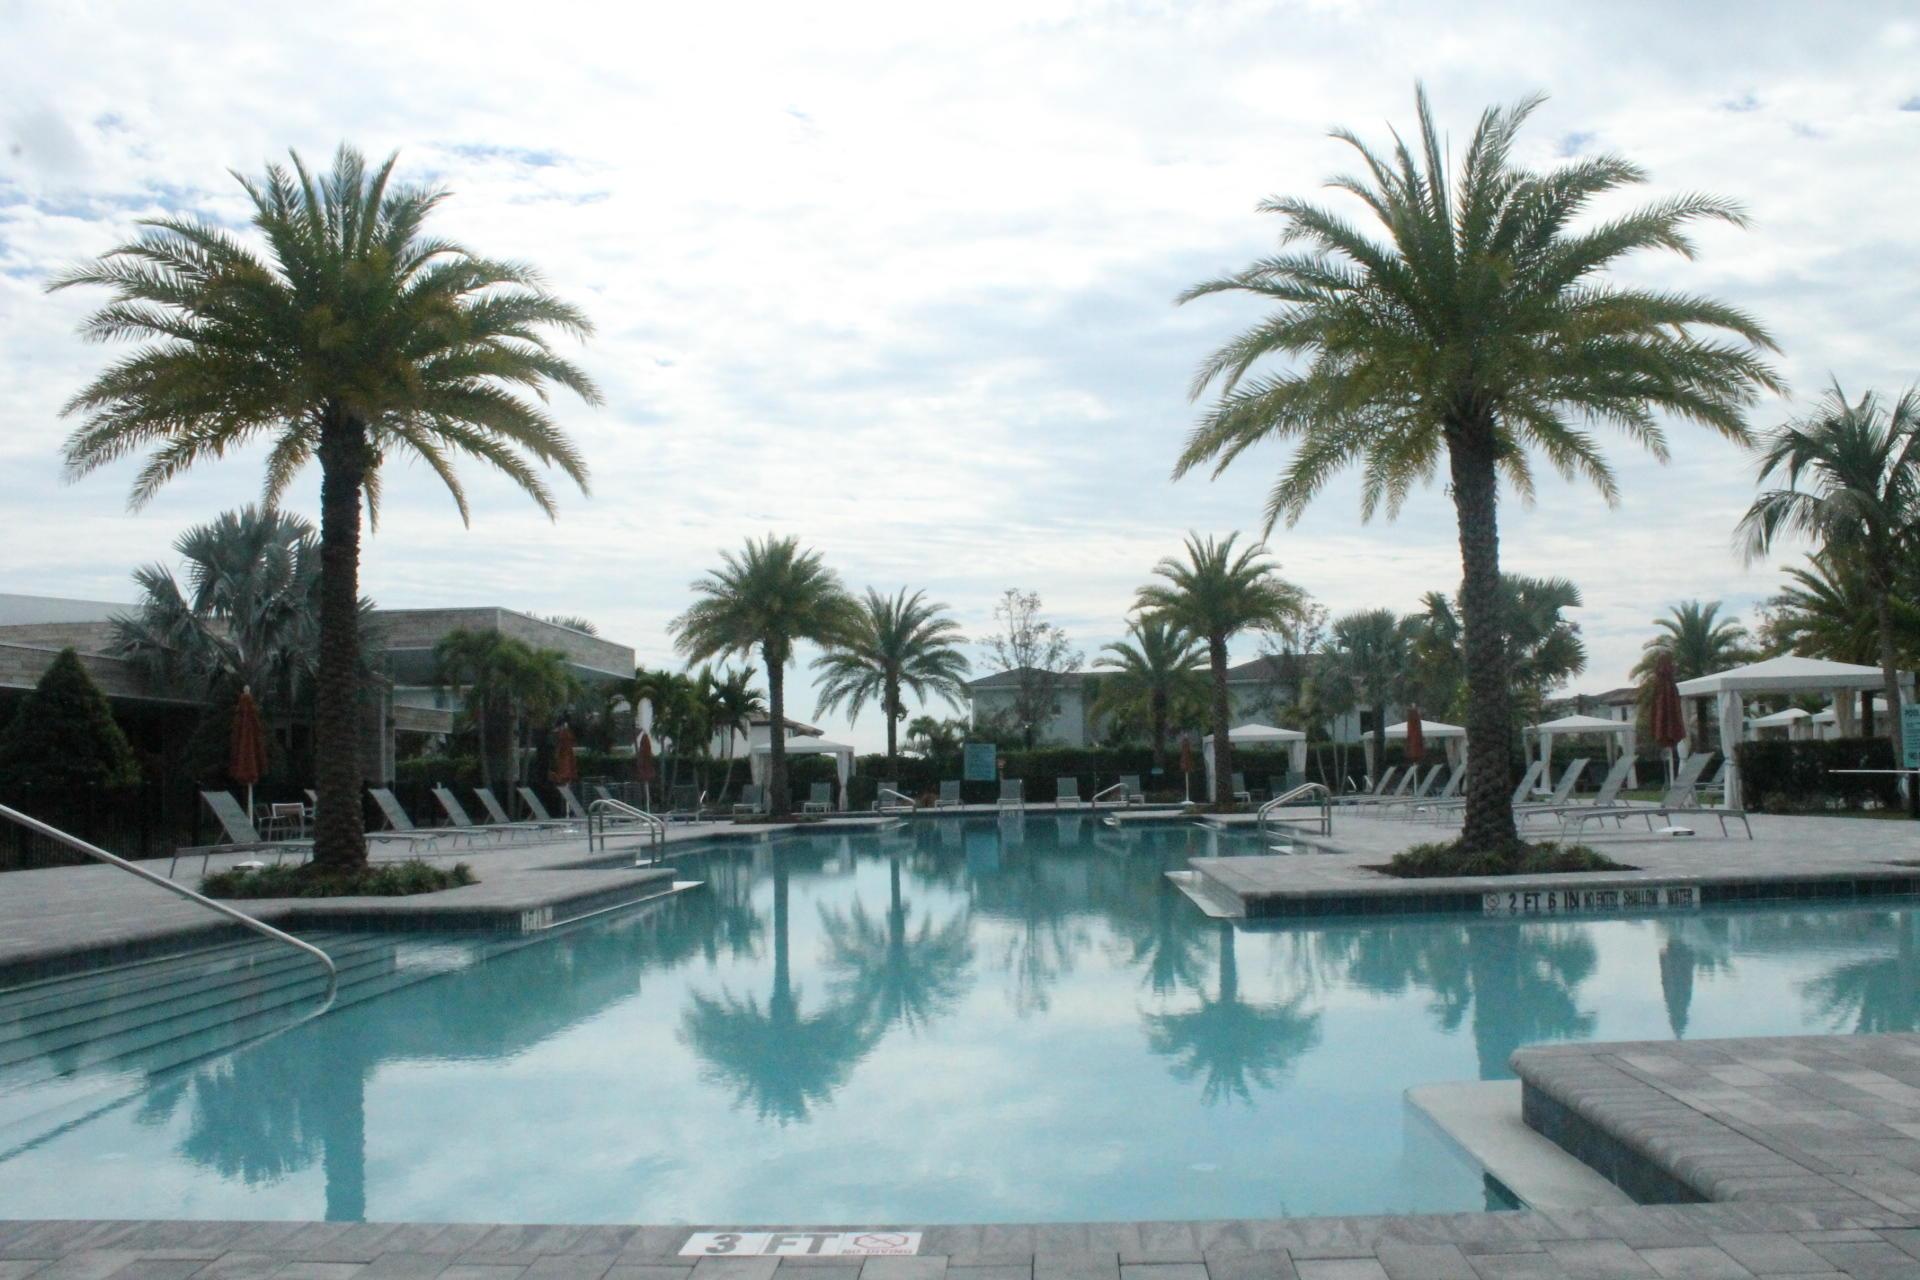 12700 Machiavelli Way - 33418 - FL - Palm Beach Gardens